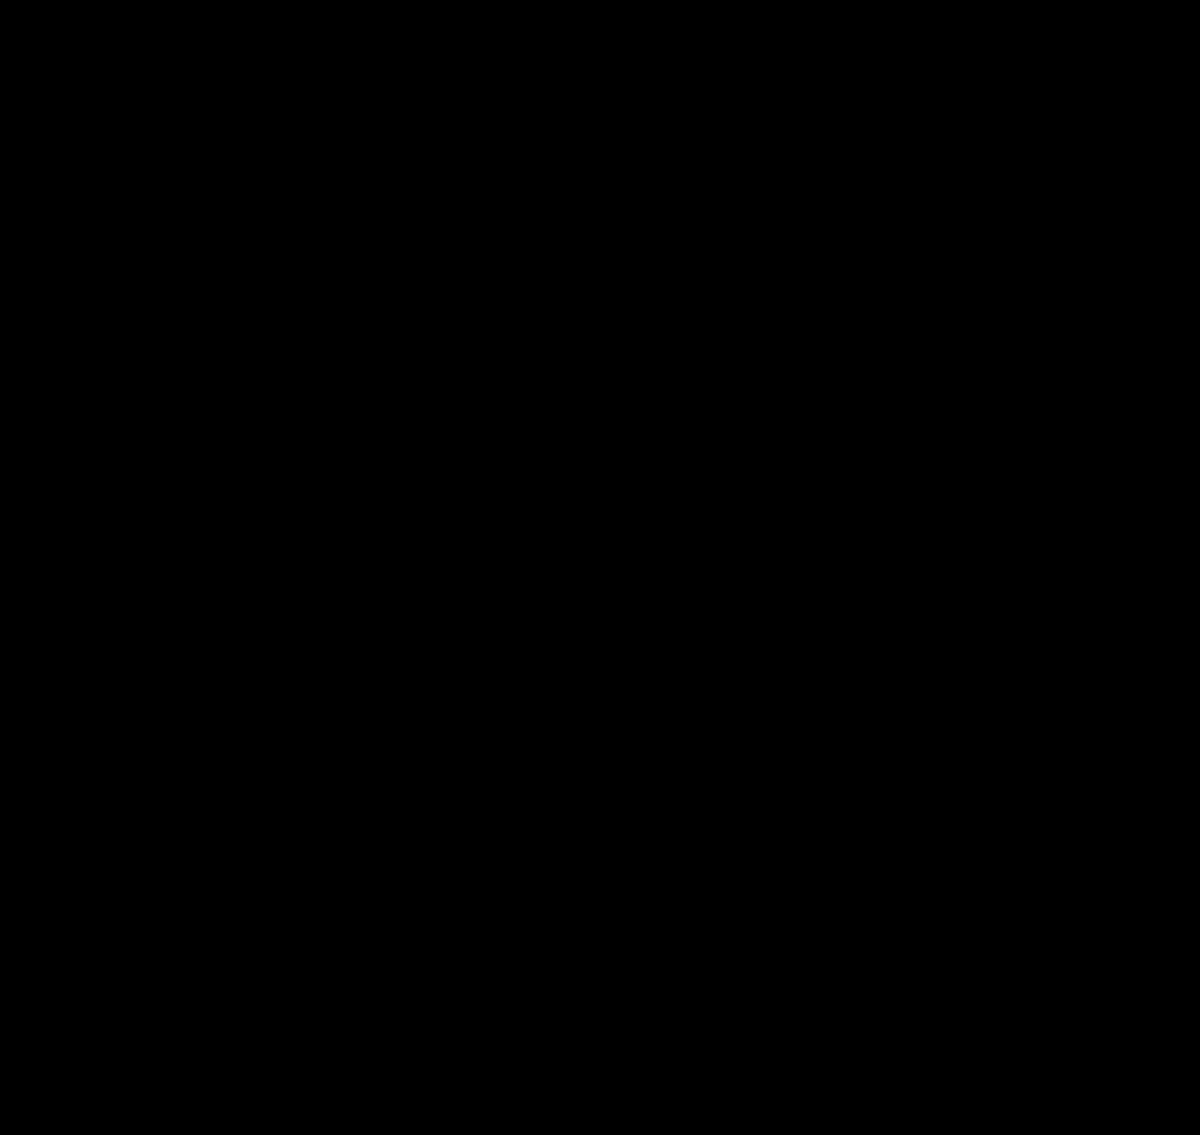 Swansea city logo clipart svg free stock Swansea City A.F.C. - Wikipedia svg free stock